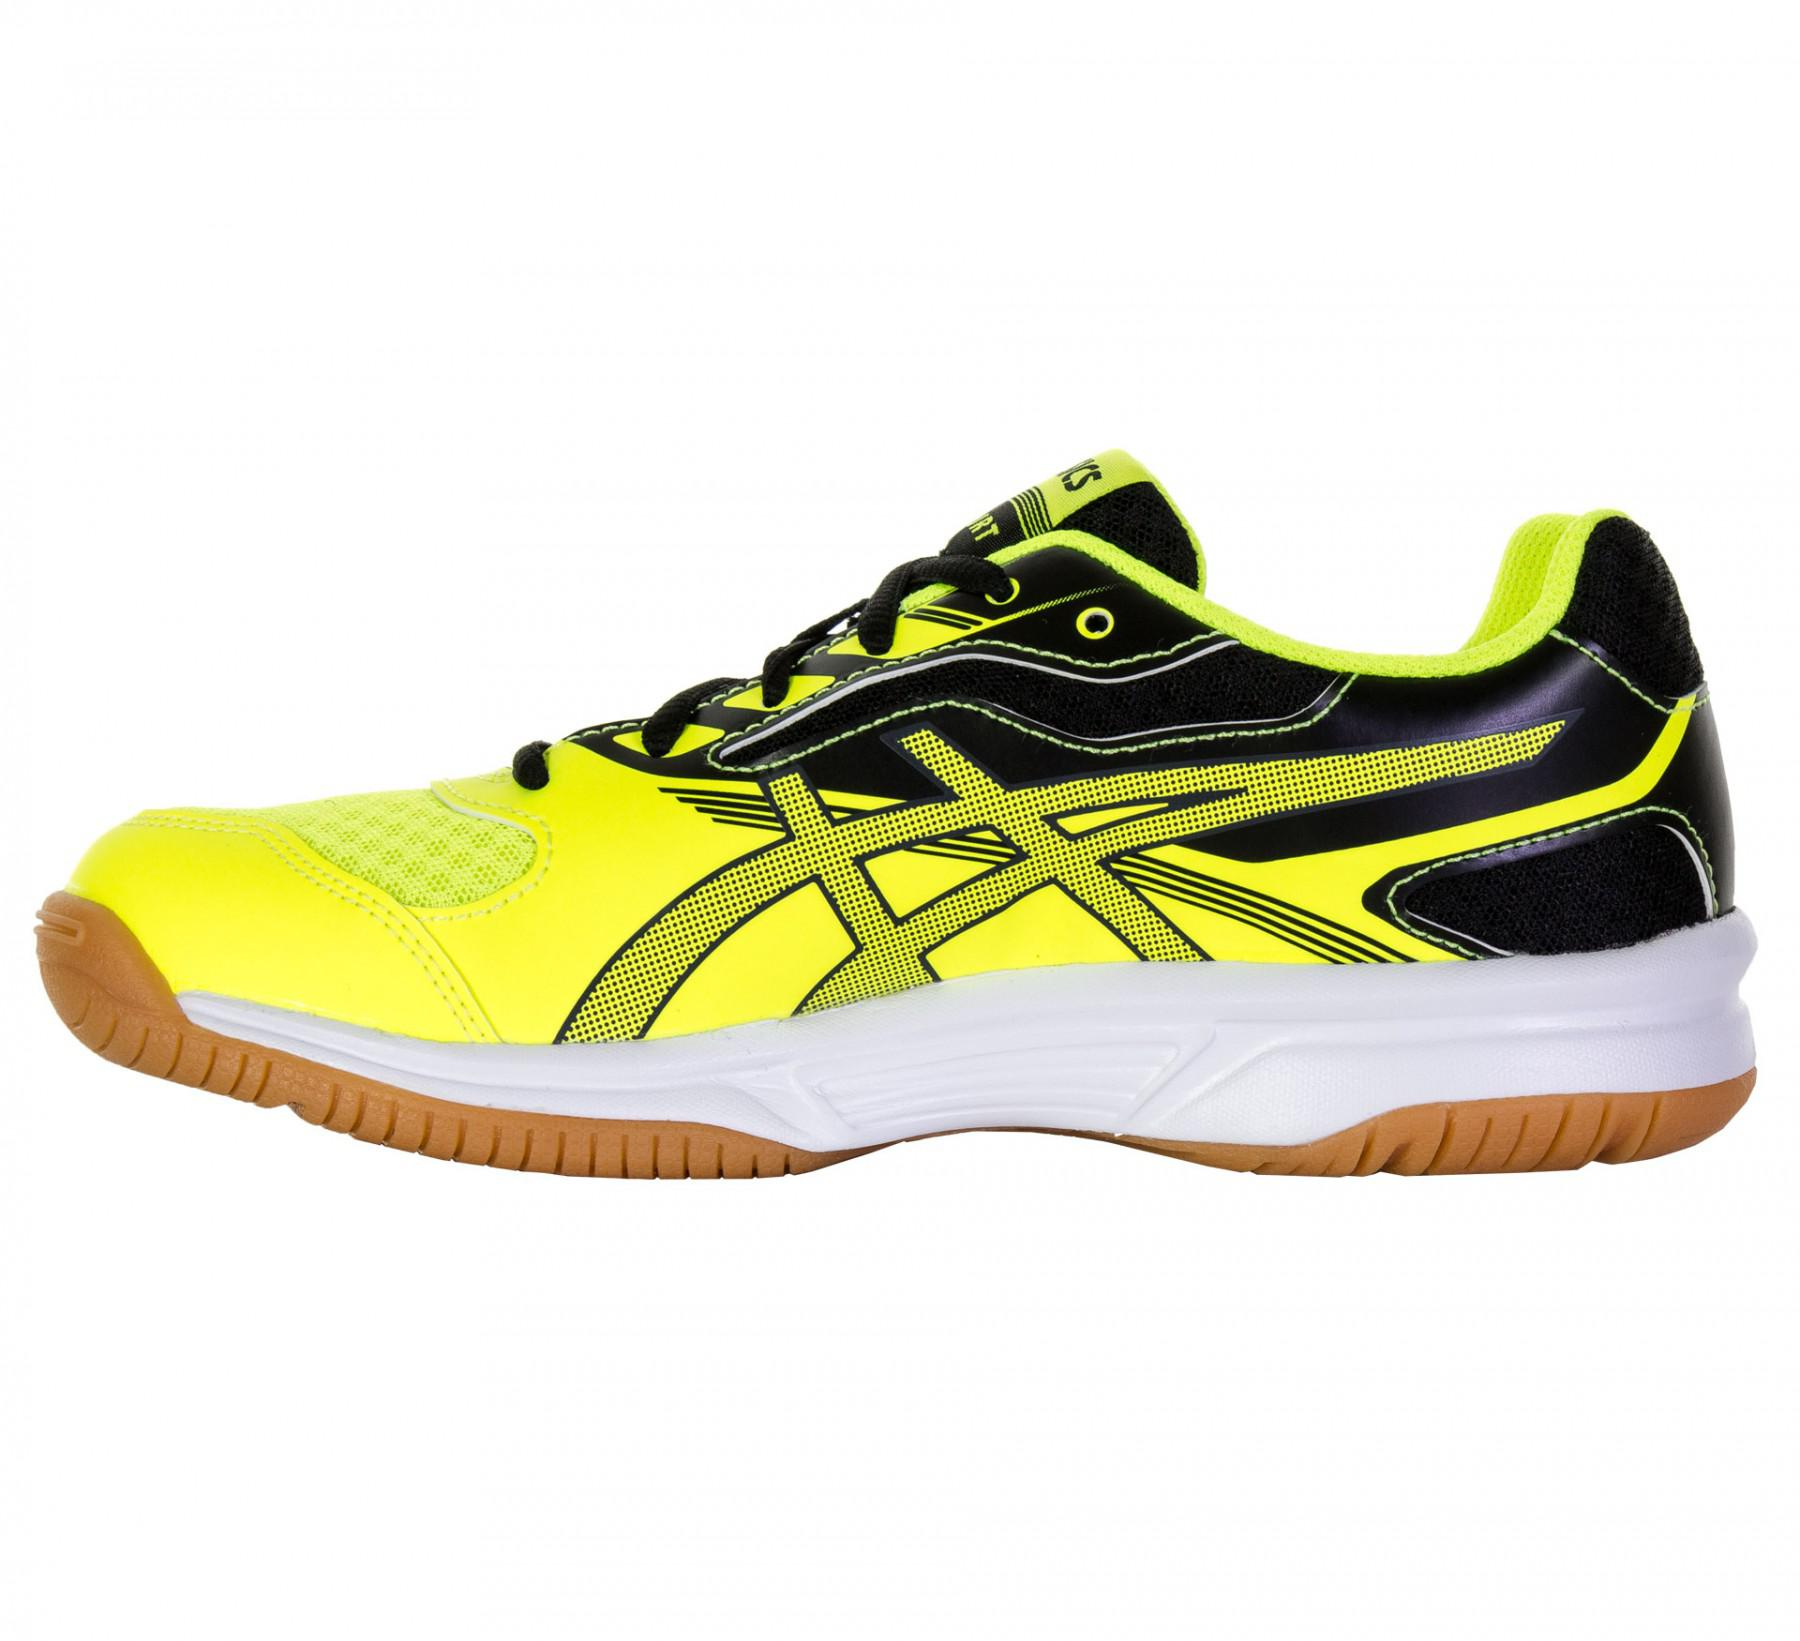 Asics Kids GEL-Upcourt 2 GS Indoor Court Shoes - Safety Yellow Black.  £39.99. Asics Kids GEL-Upcourt 2 ... 3d64d2746be97